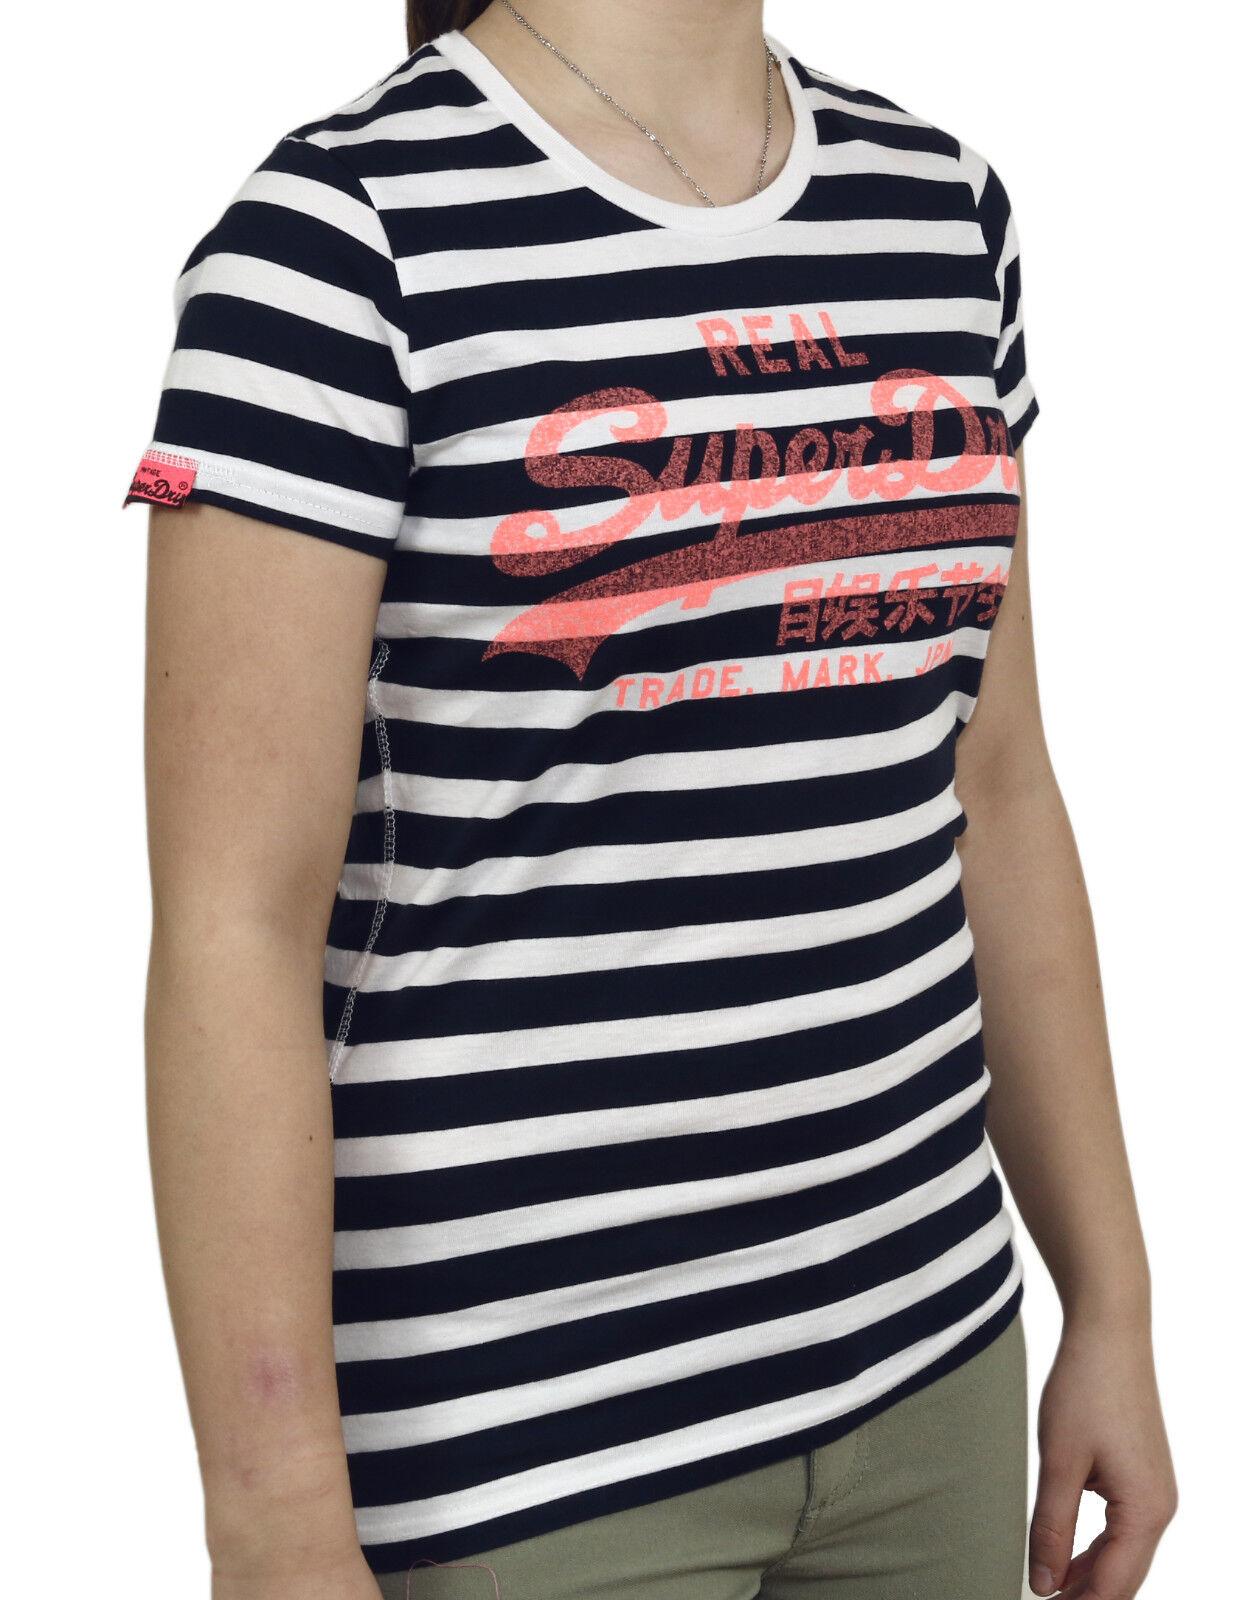 Superdry Vint.Logo Stripe G10023XO JKC navy - Shirt - Women dunkelblue white+Neu+